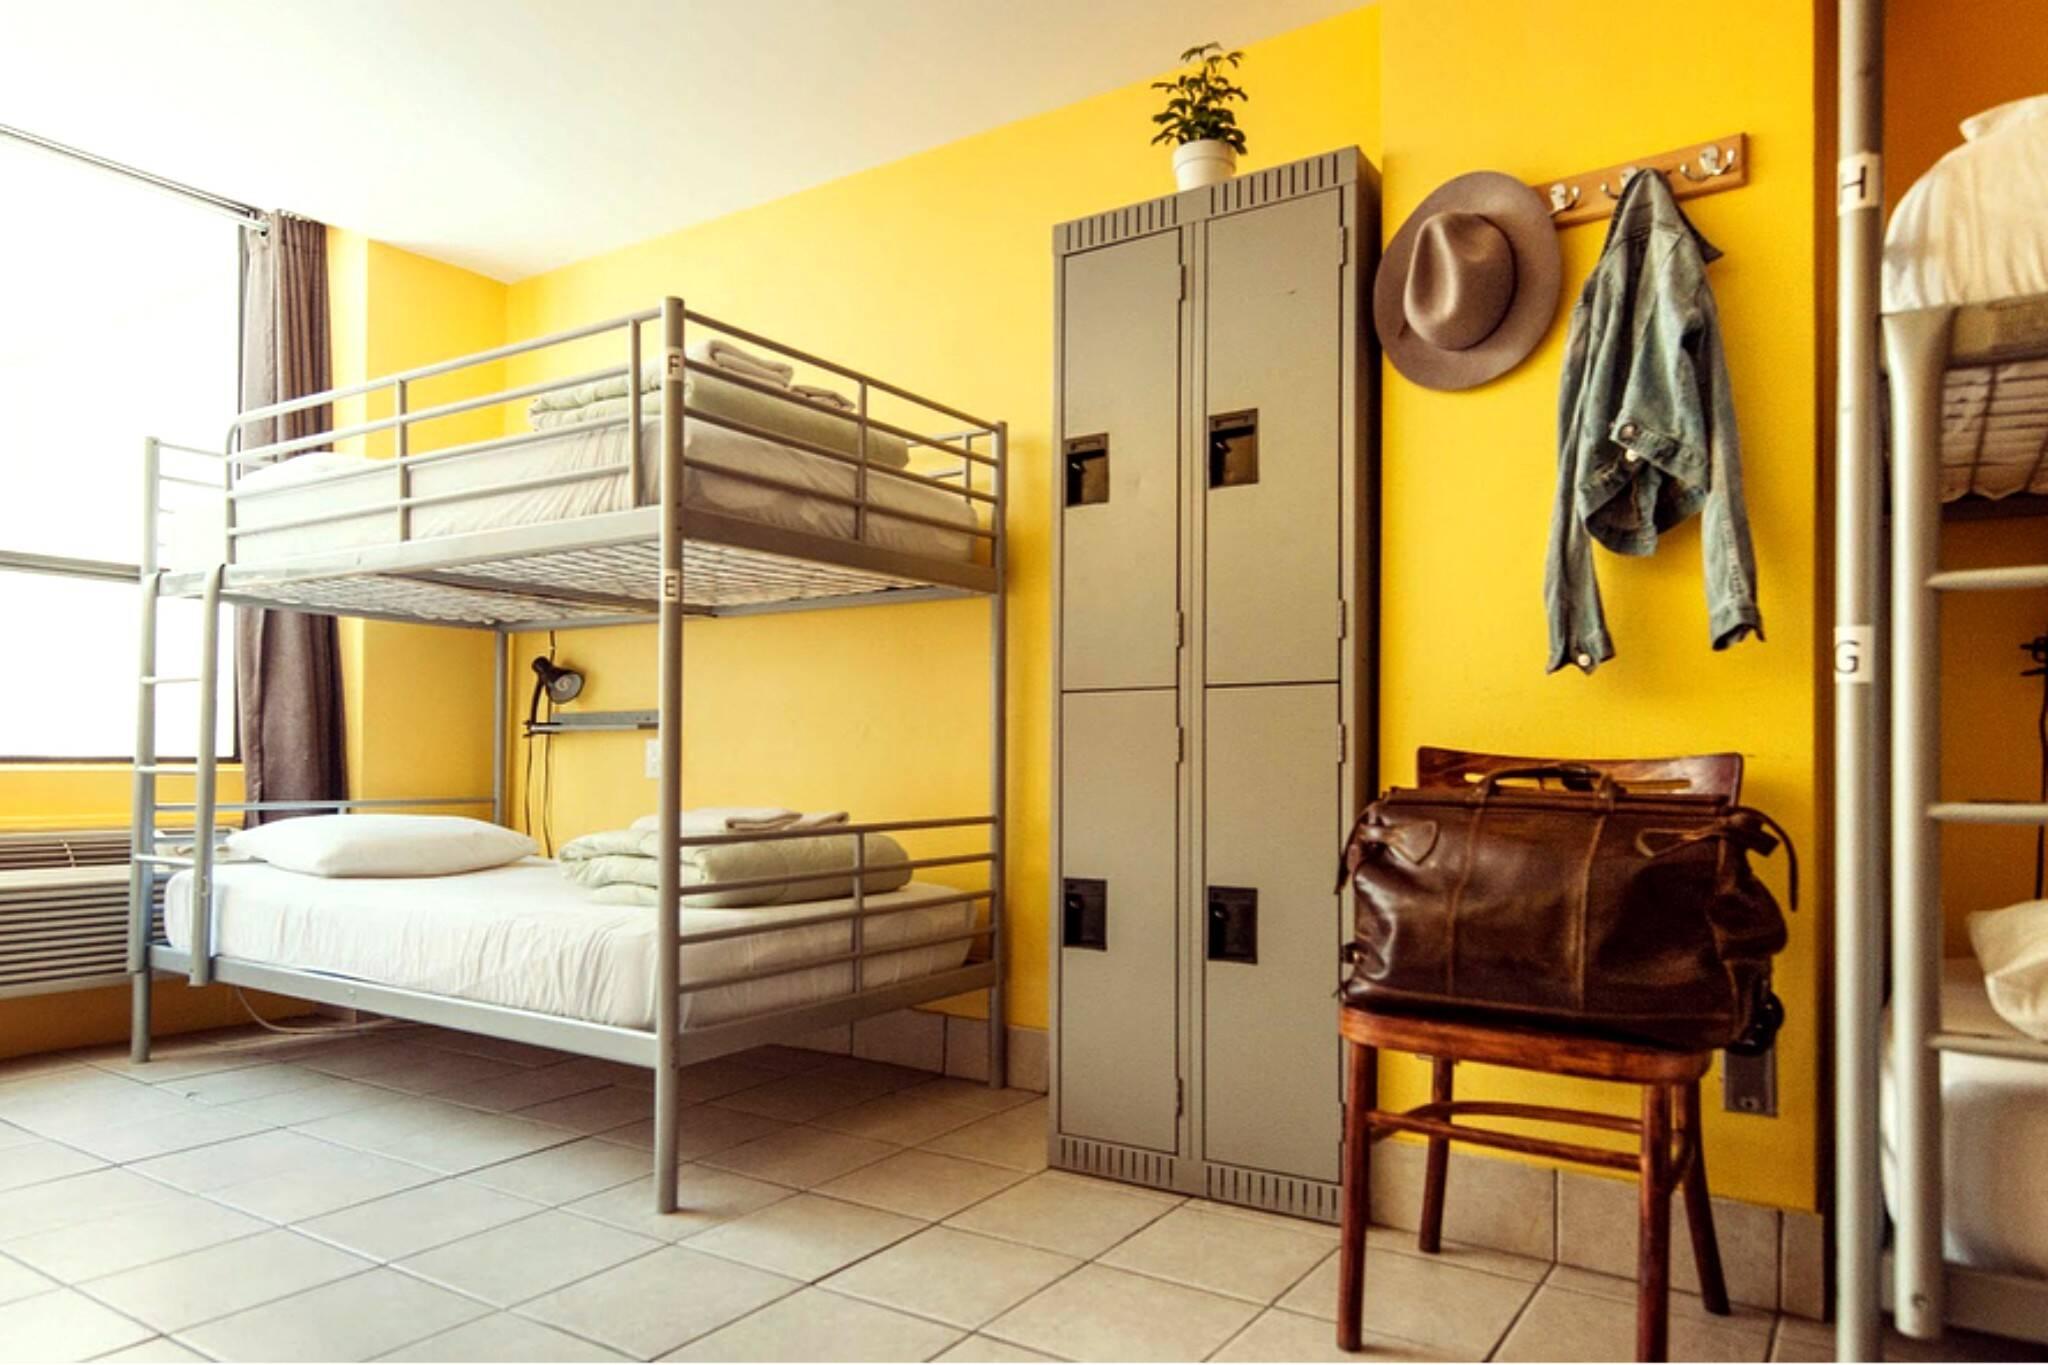 Hostels Toronto